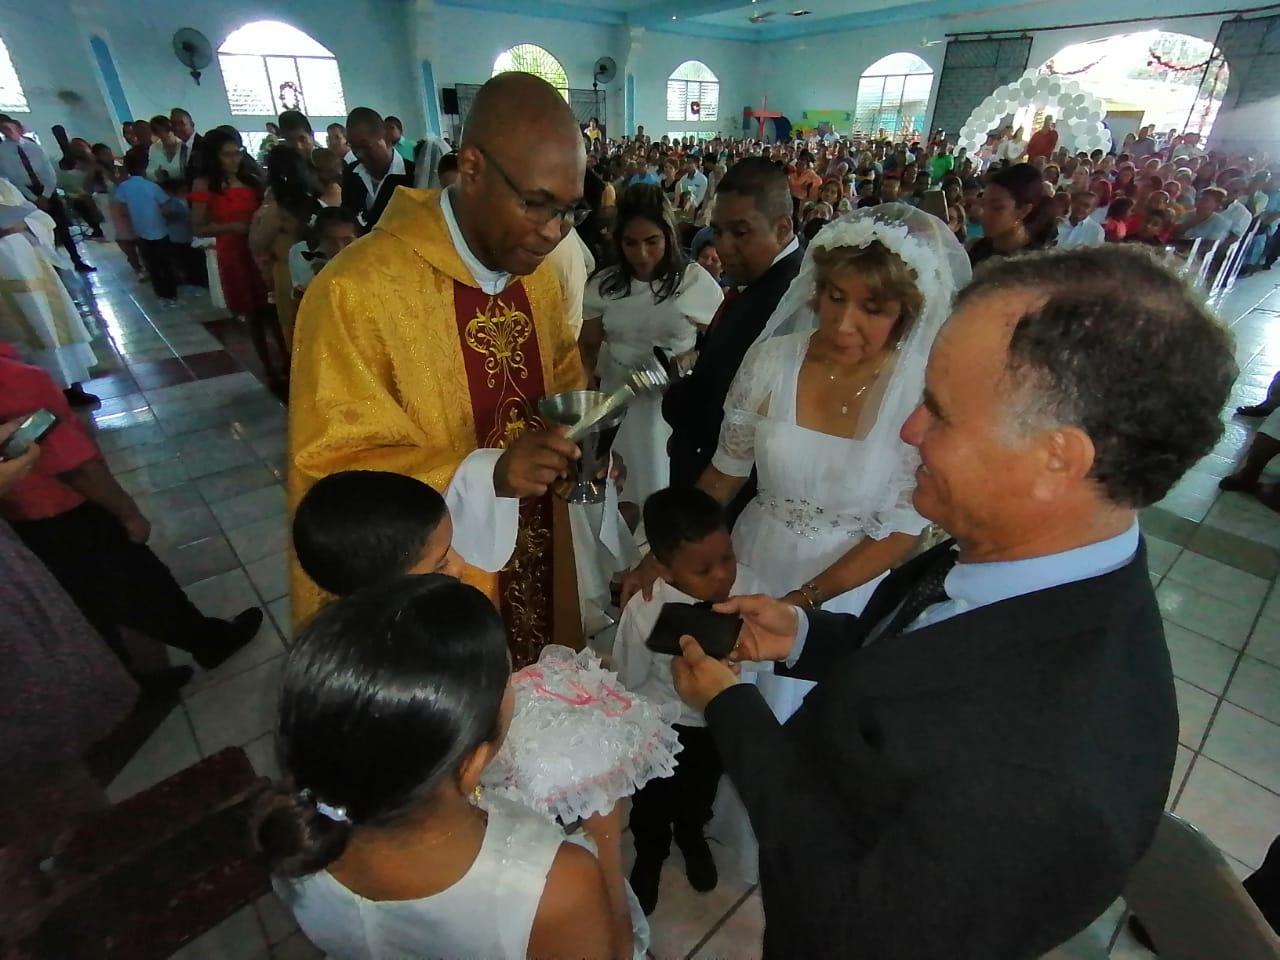 Nueve parejas consagradas en matrimonio en la festividad de la Sagrada Familia